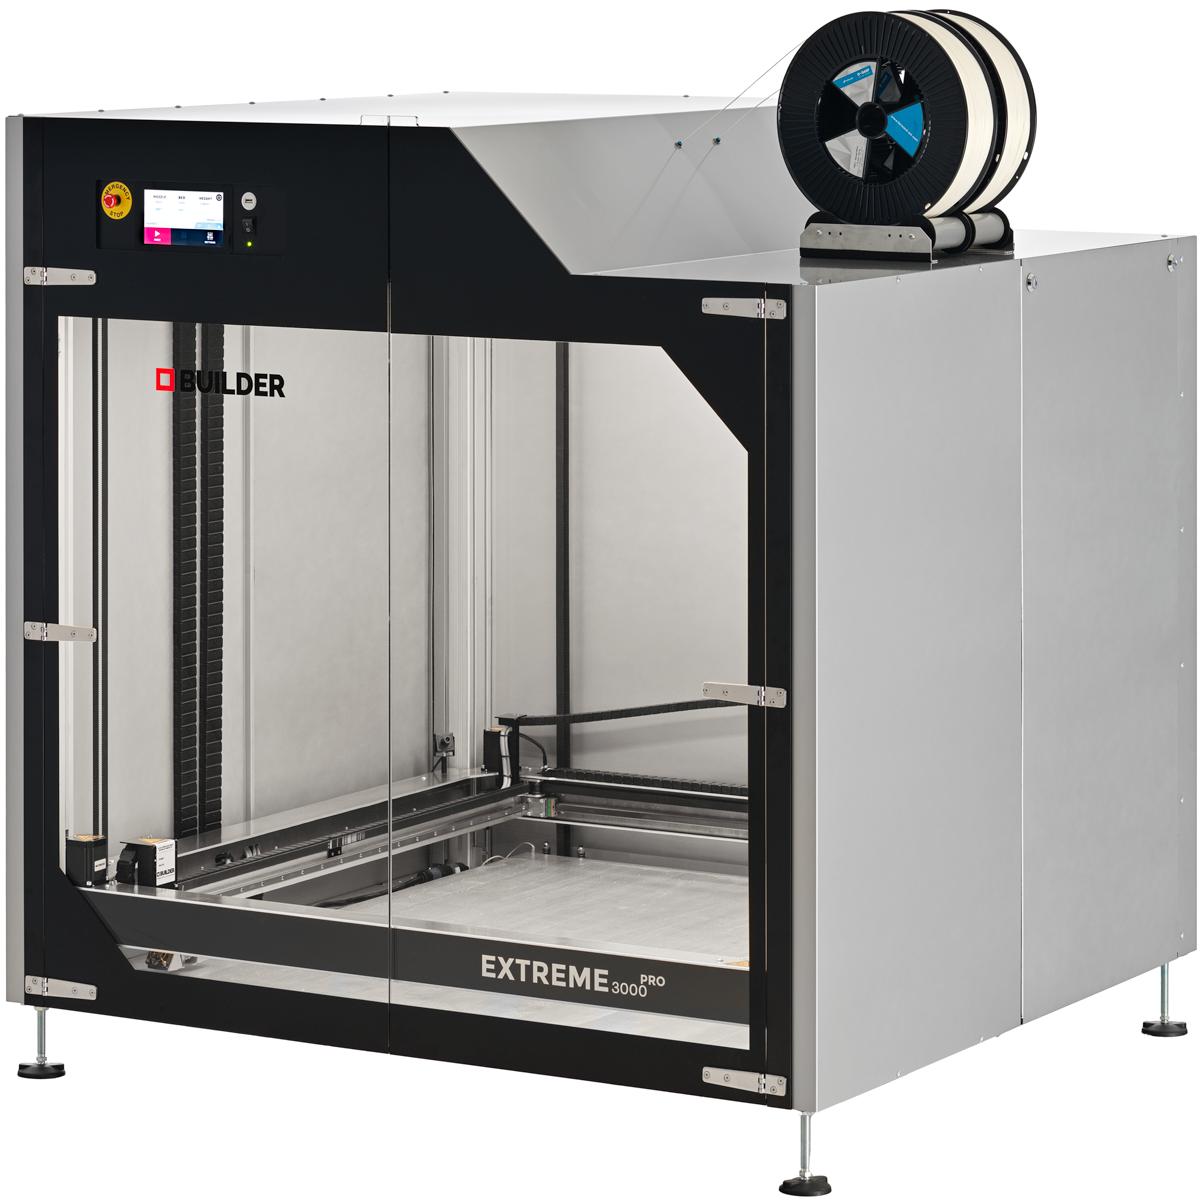 Large Scale 3D Printers - Builder 3D Printers